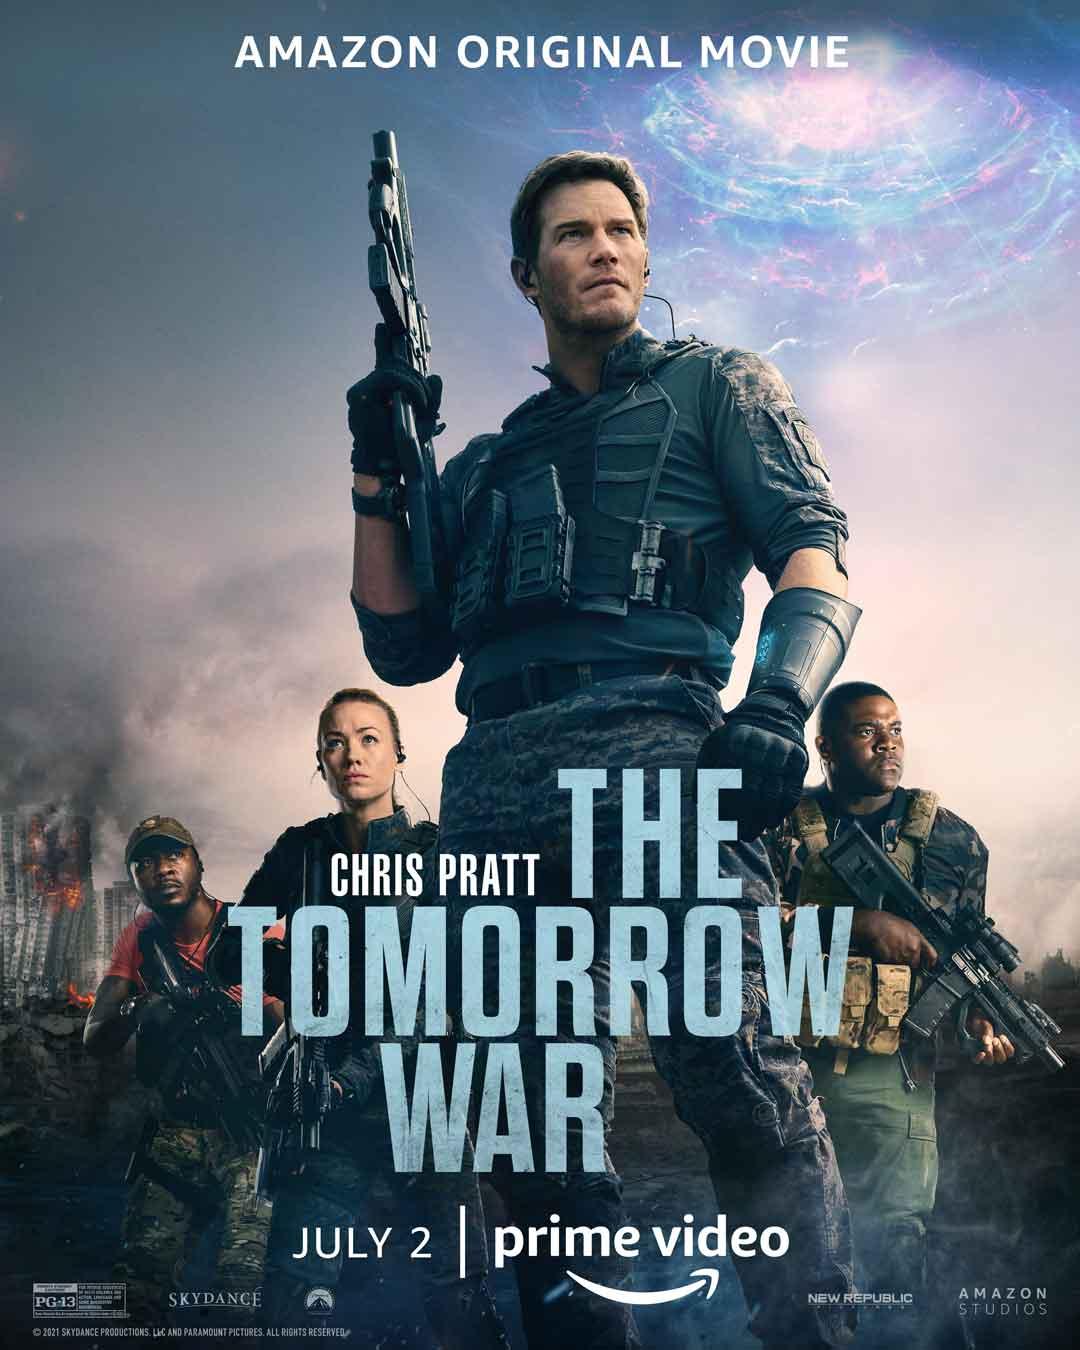 Chris Pratt The Tomorrow War poster